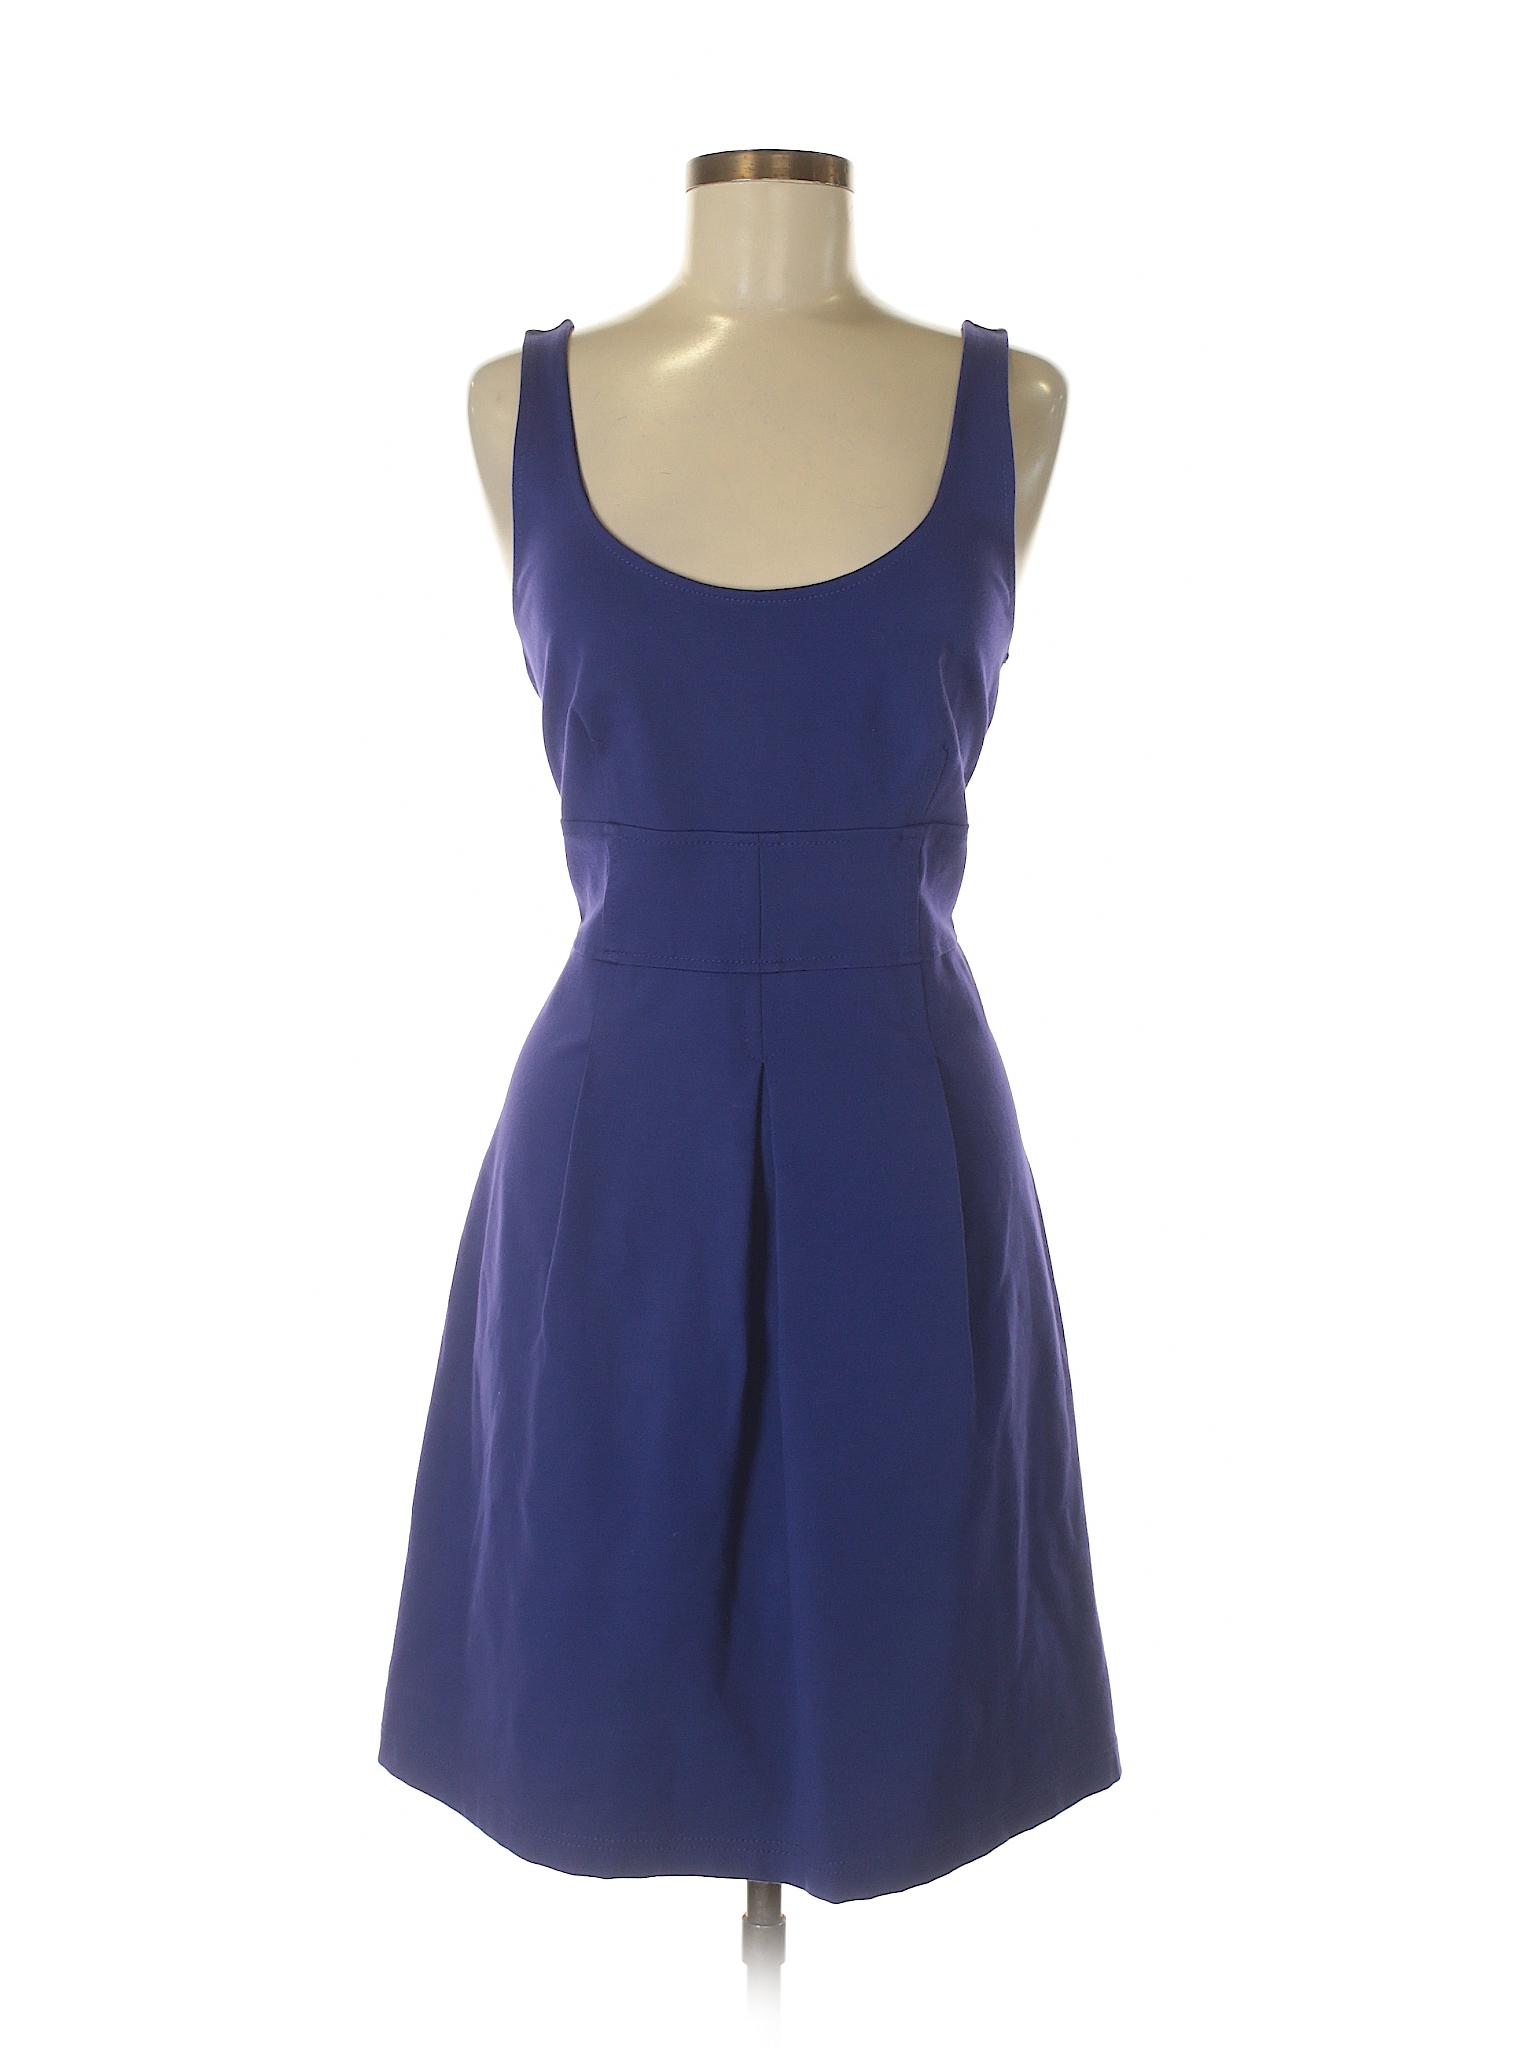 Taylor winter Boutique Casual LOFT Dress Ann 6Ex71wOx